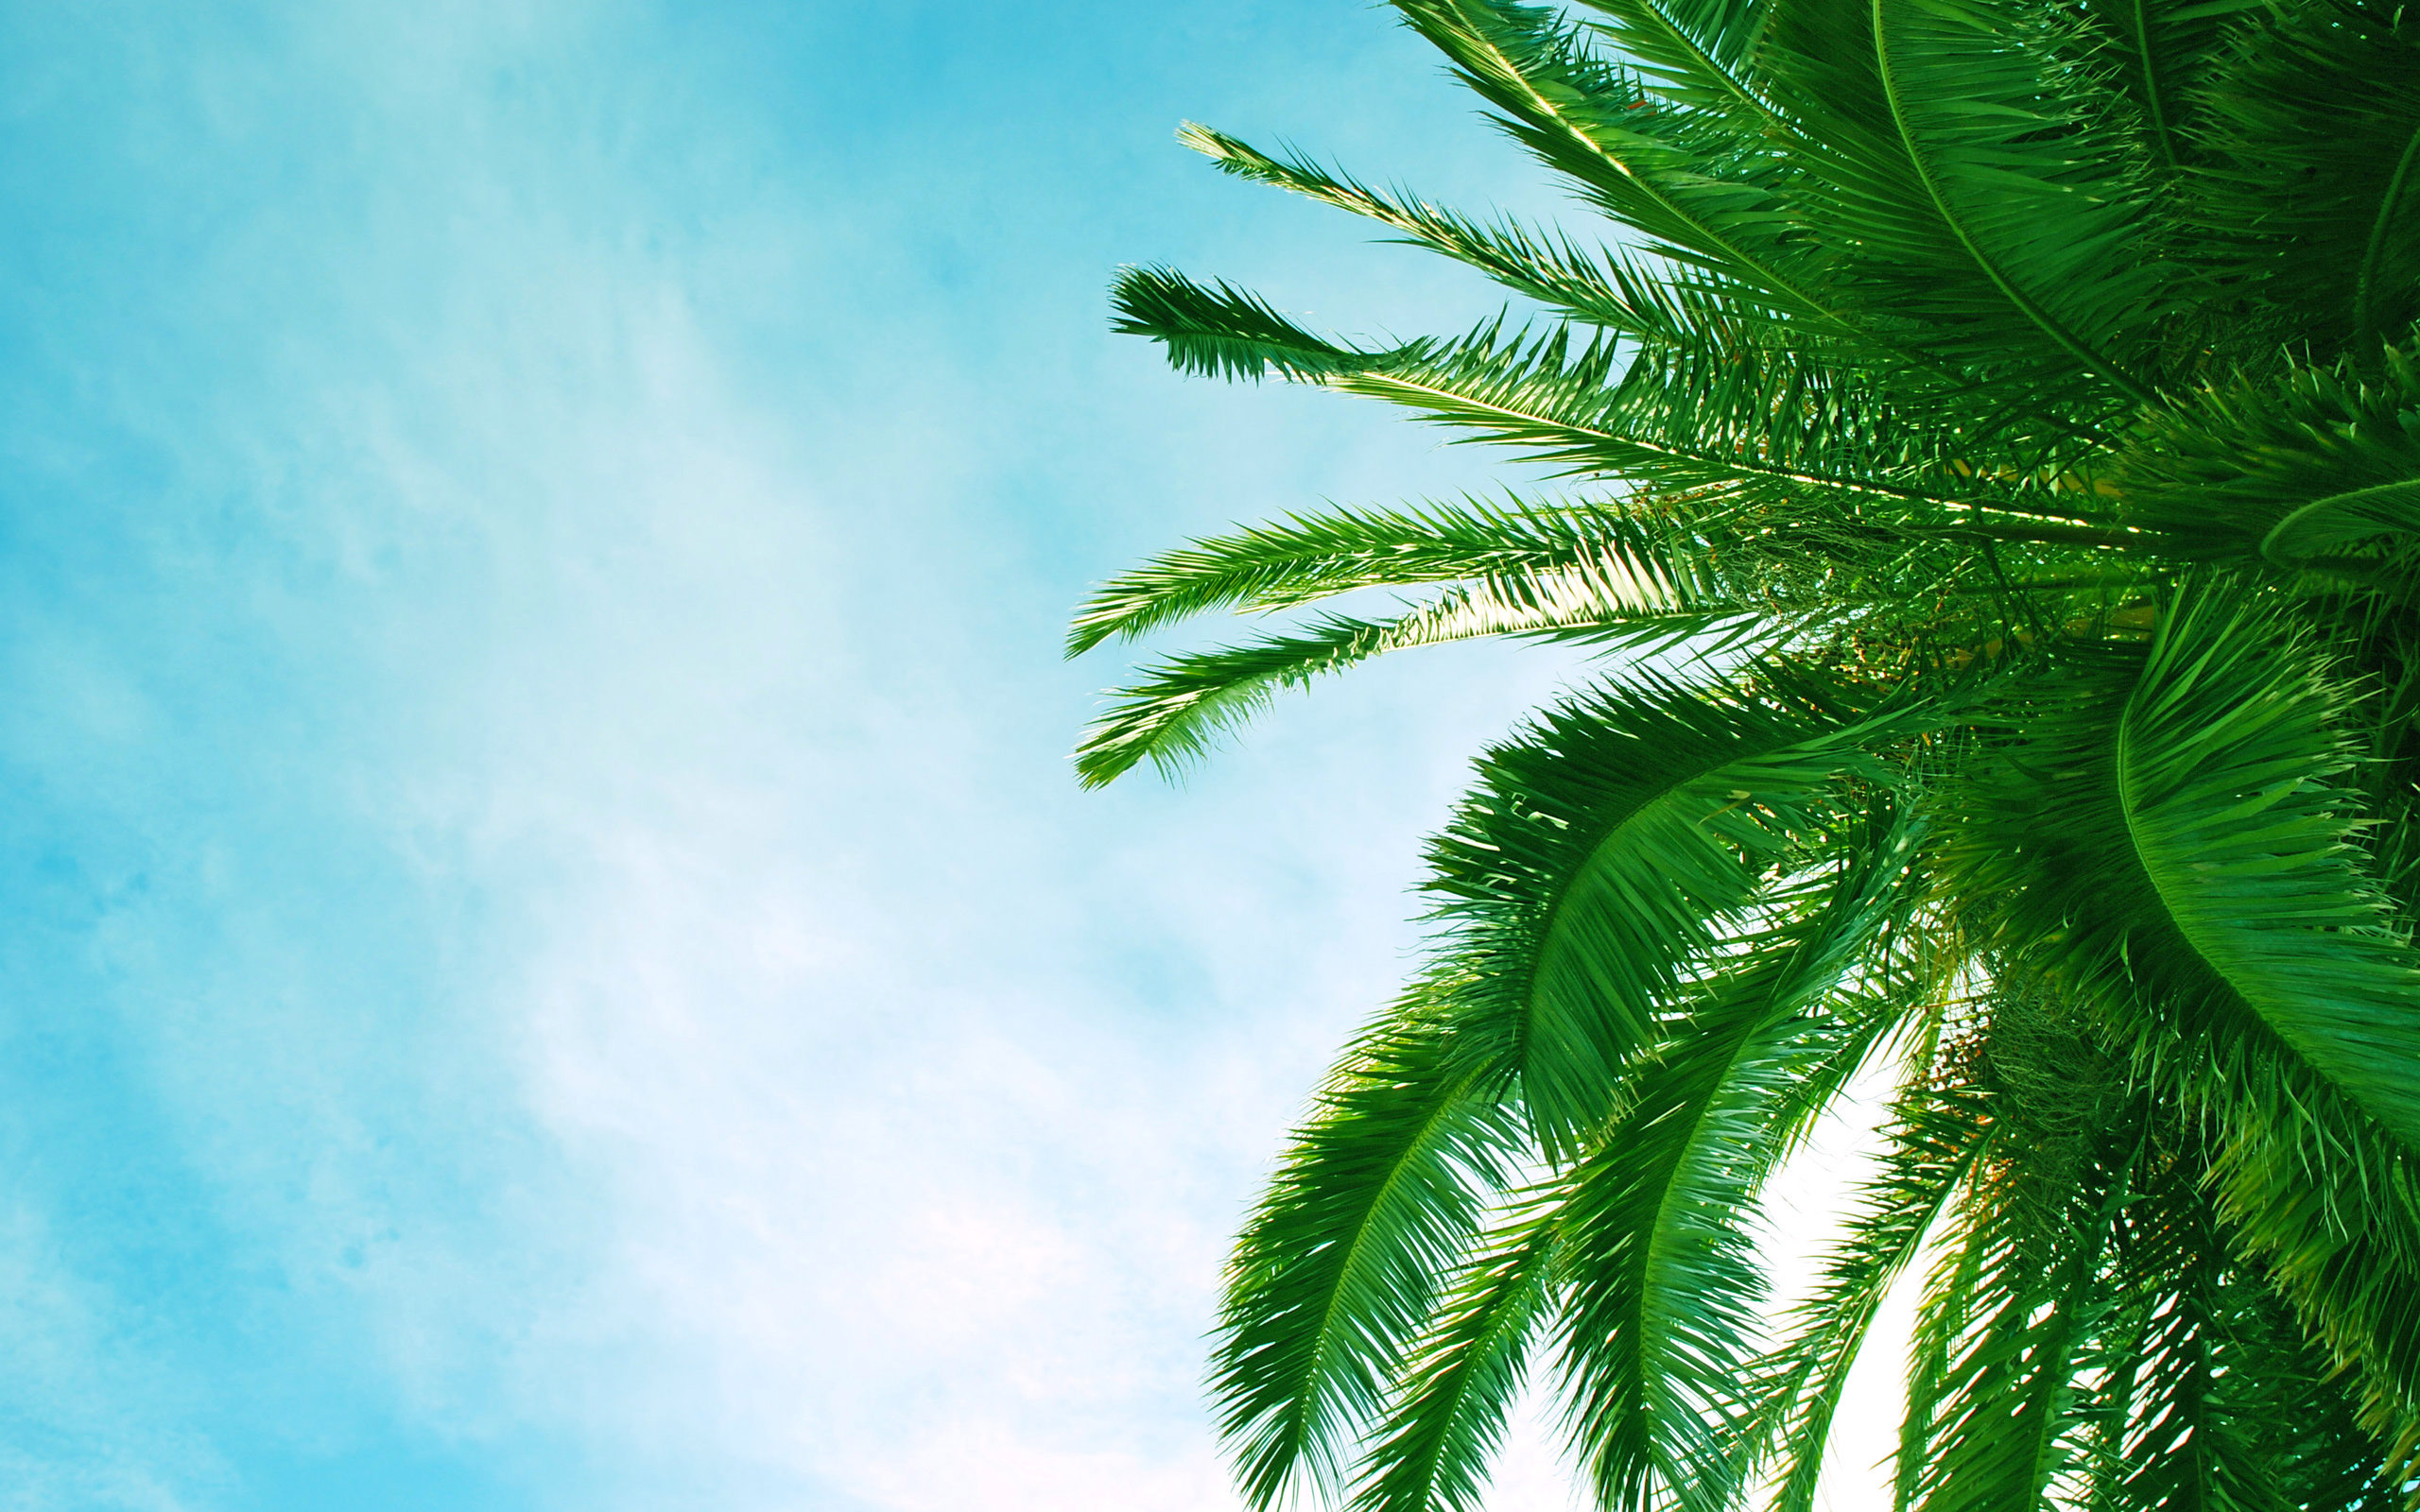 15 wonderful hd palm tree wallpapers